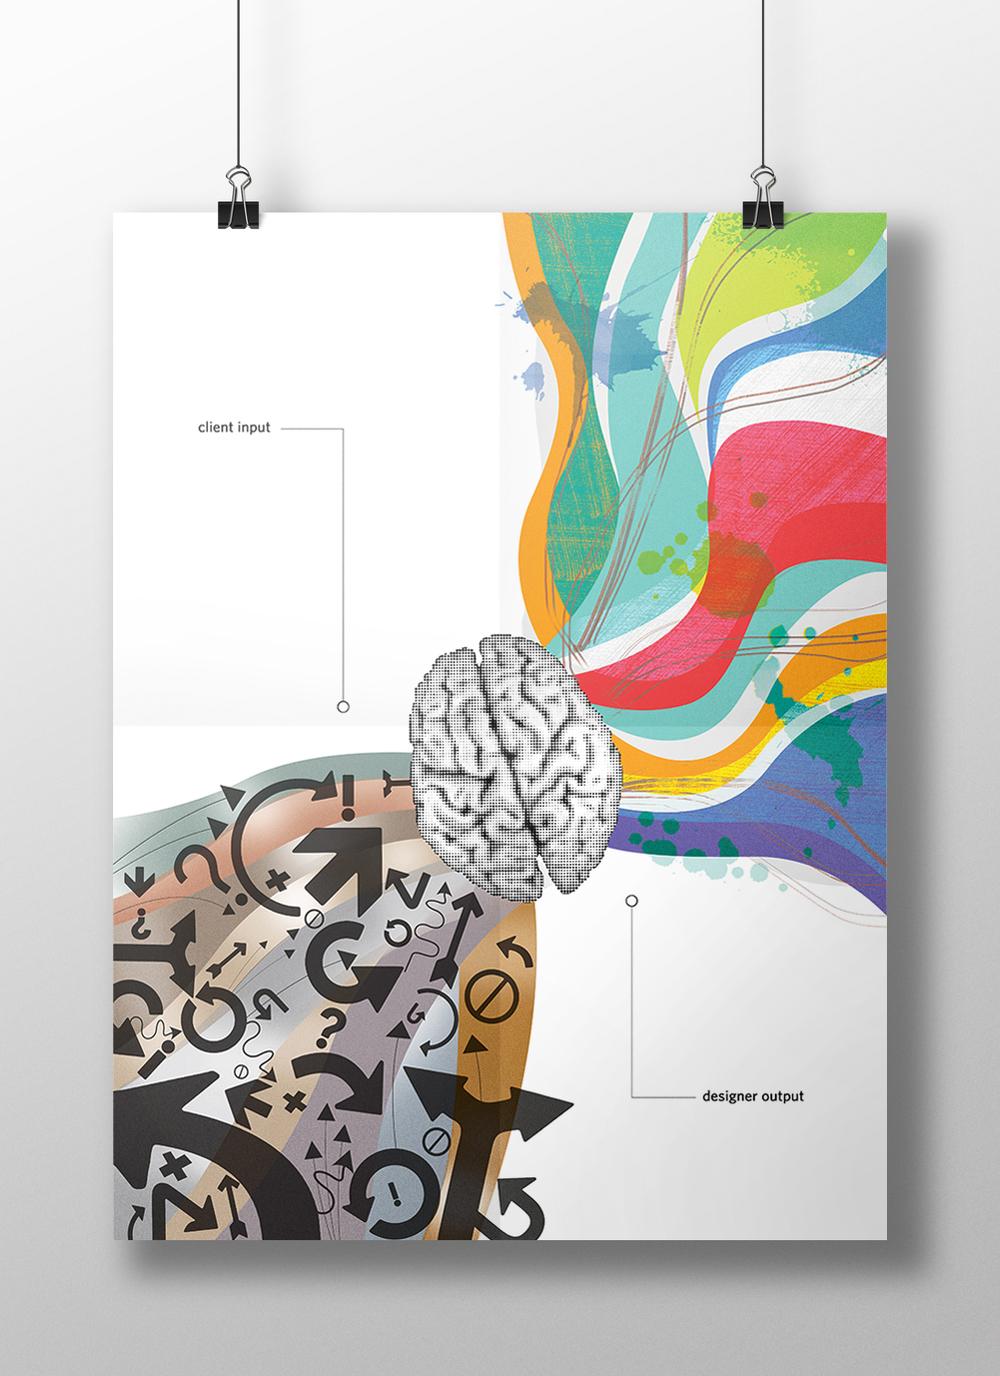 Client: Glantz Design